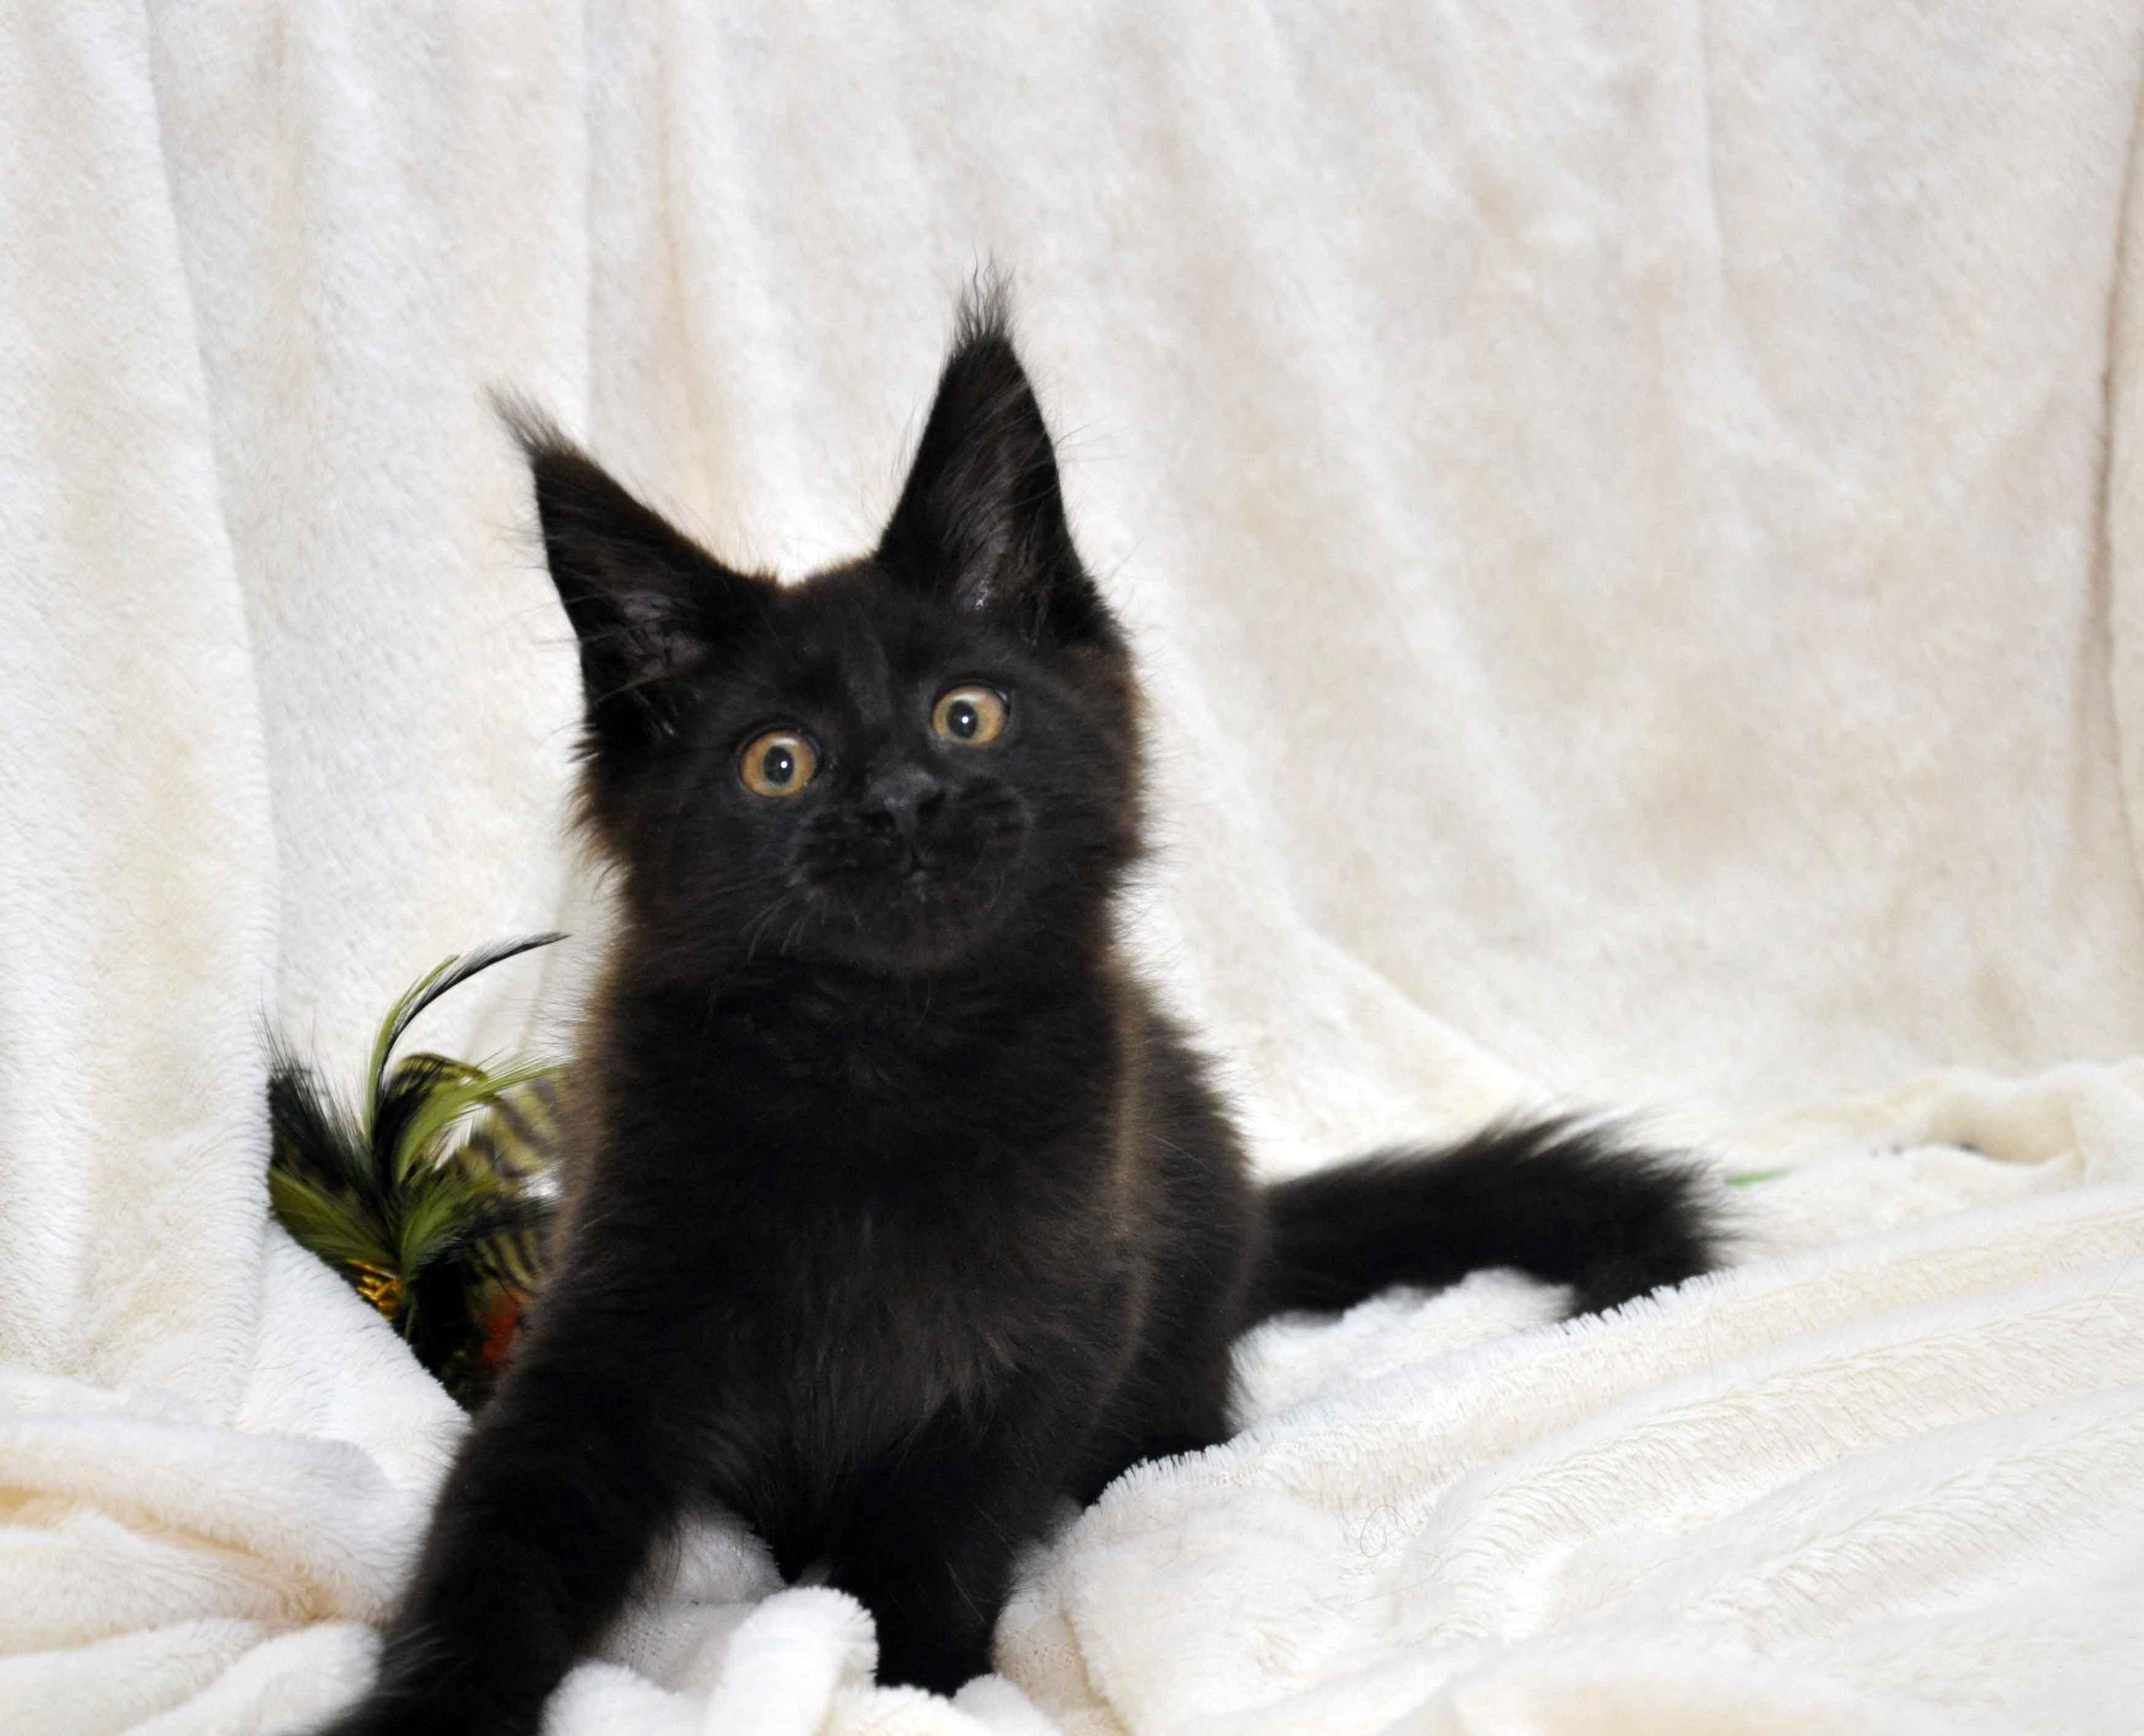 Кот мейн кун JULIOPOLIS возраст 3.5 месяца фото11